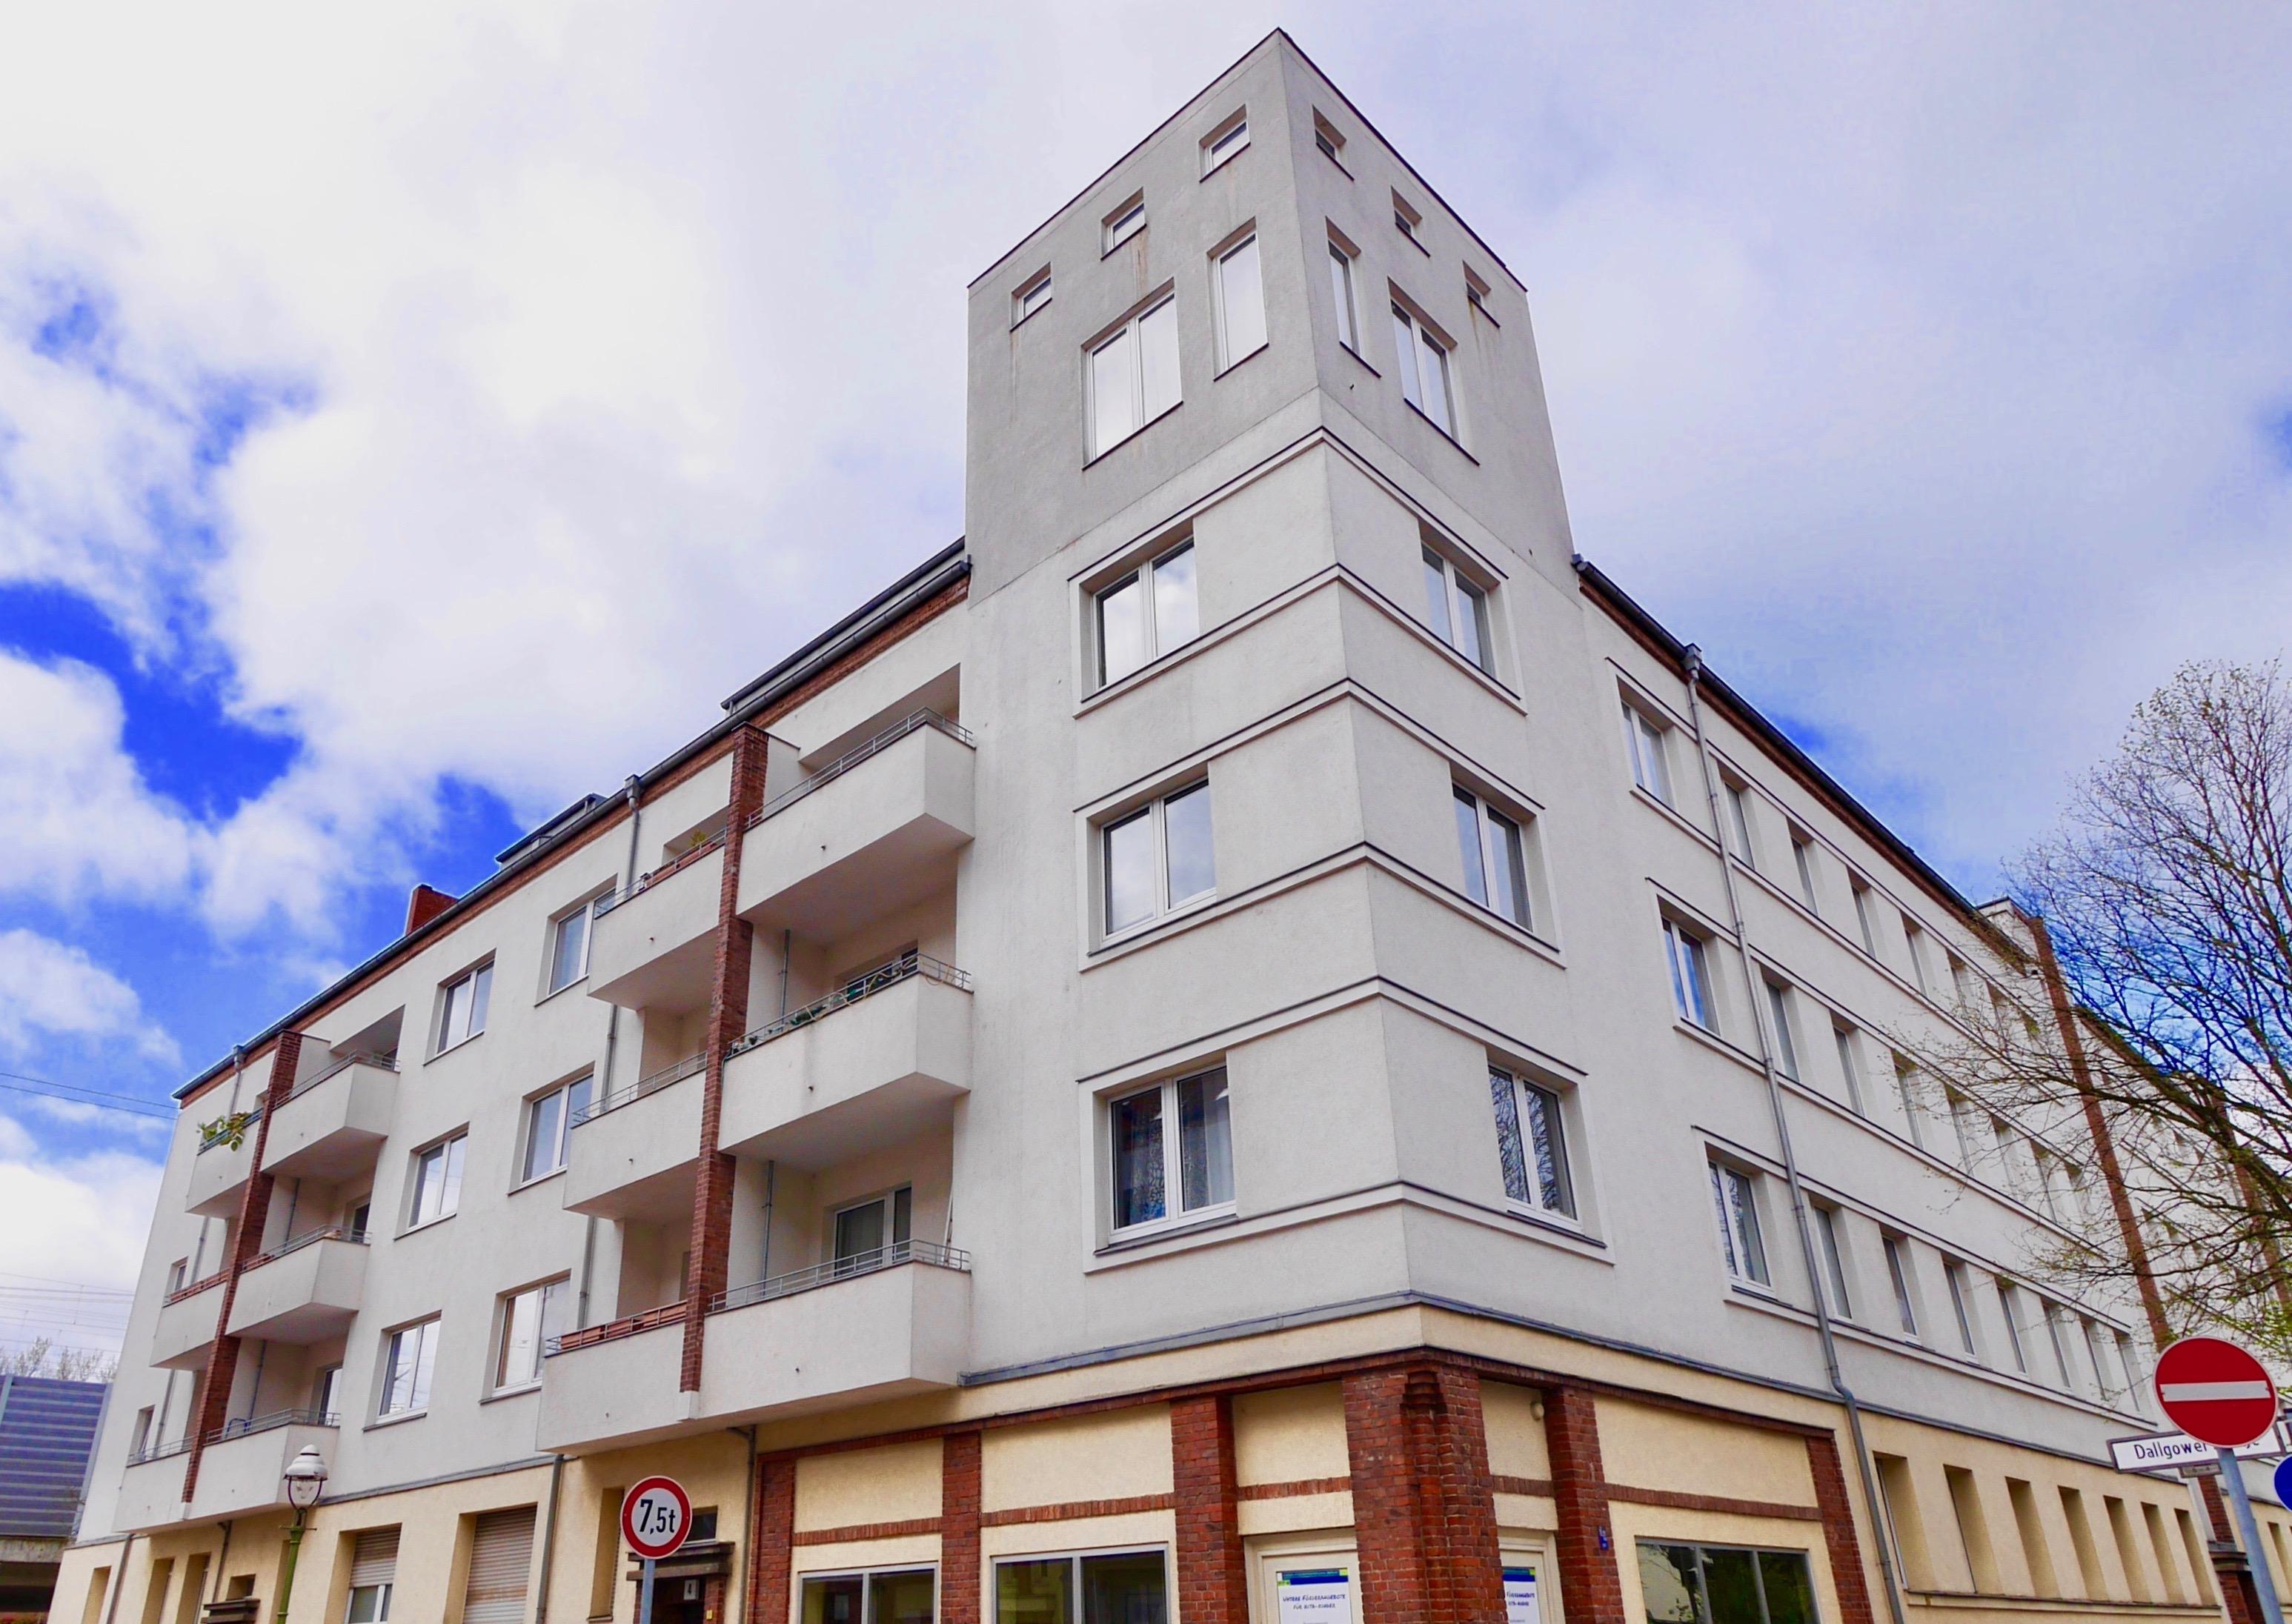 Berlin - Spandau Mietblock Seegefelder Str. / Wustermarker Str.